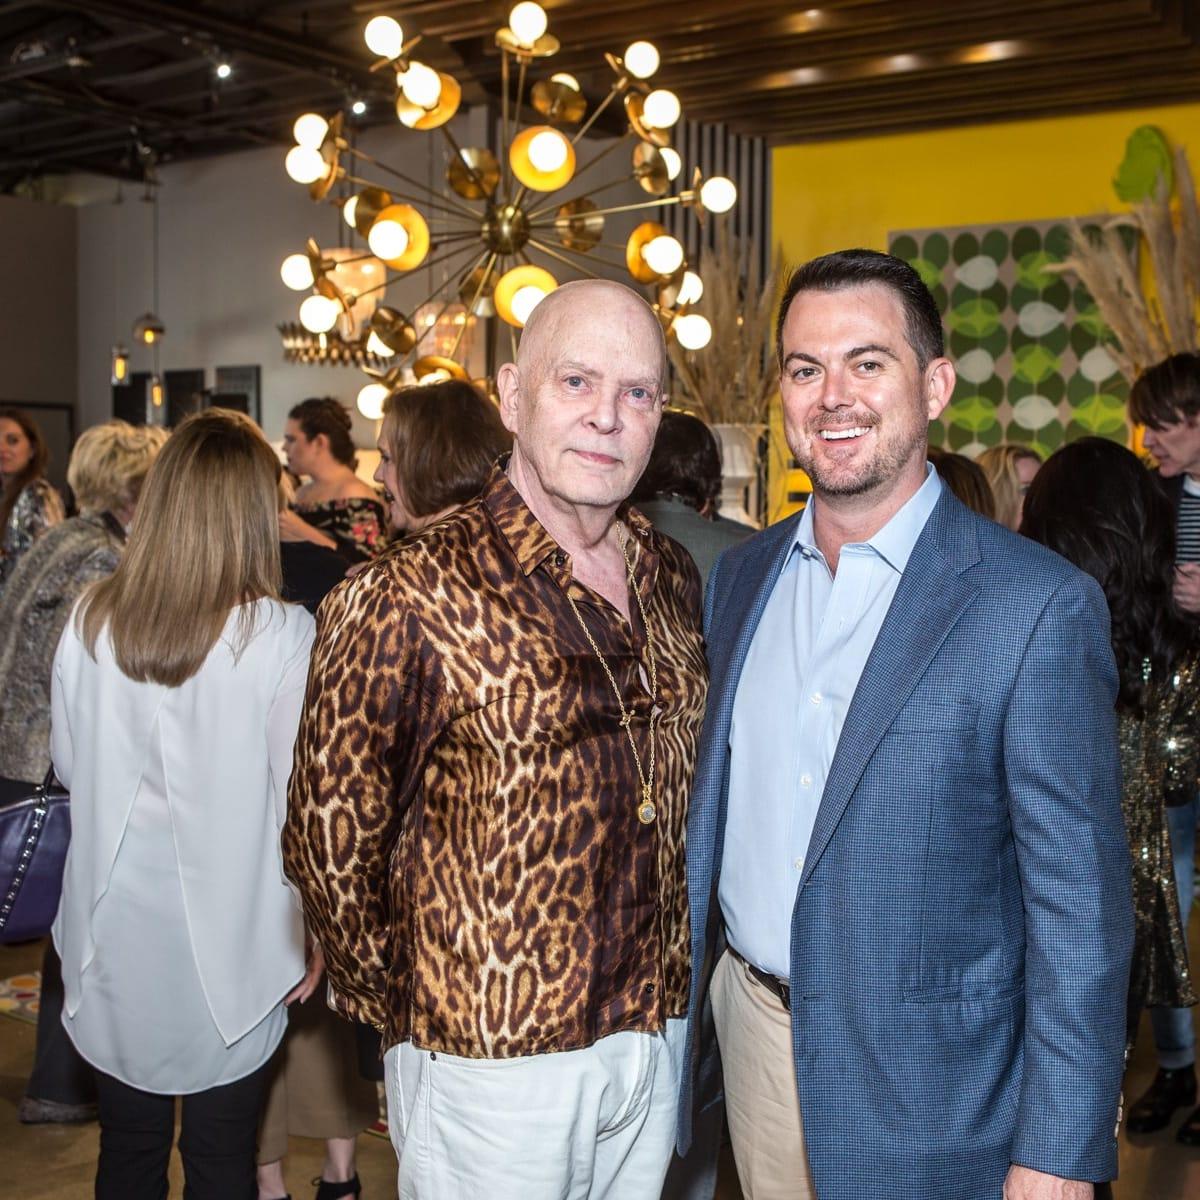 Colby McWilliams, Jim Sheehan, Arteriors Party 2018